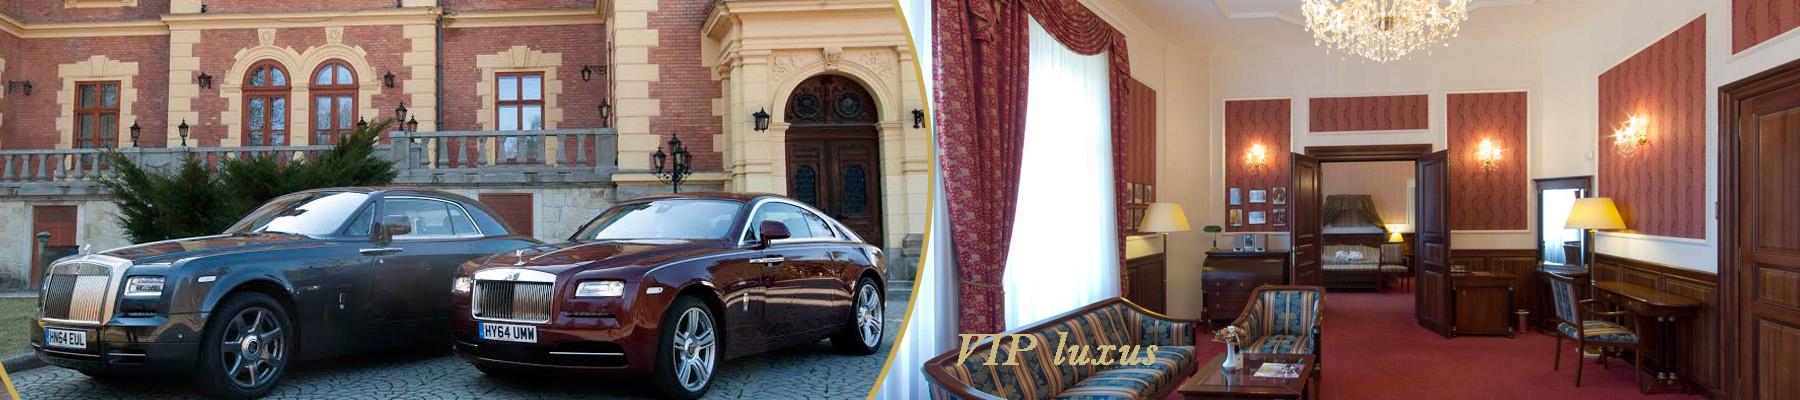 VIP_luxus_khs3